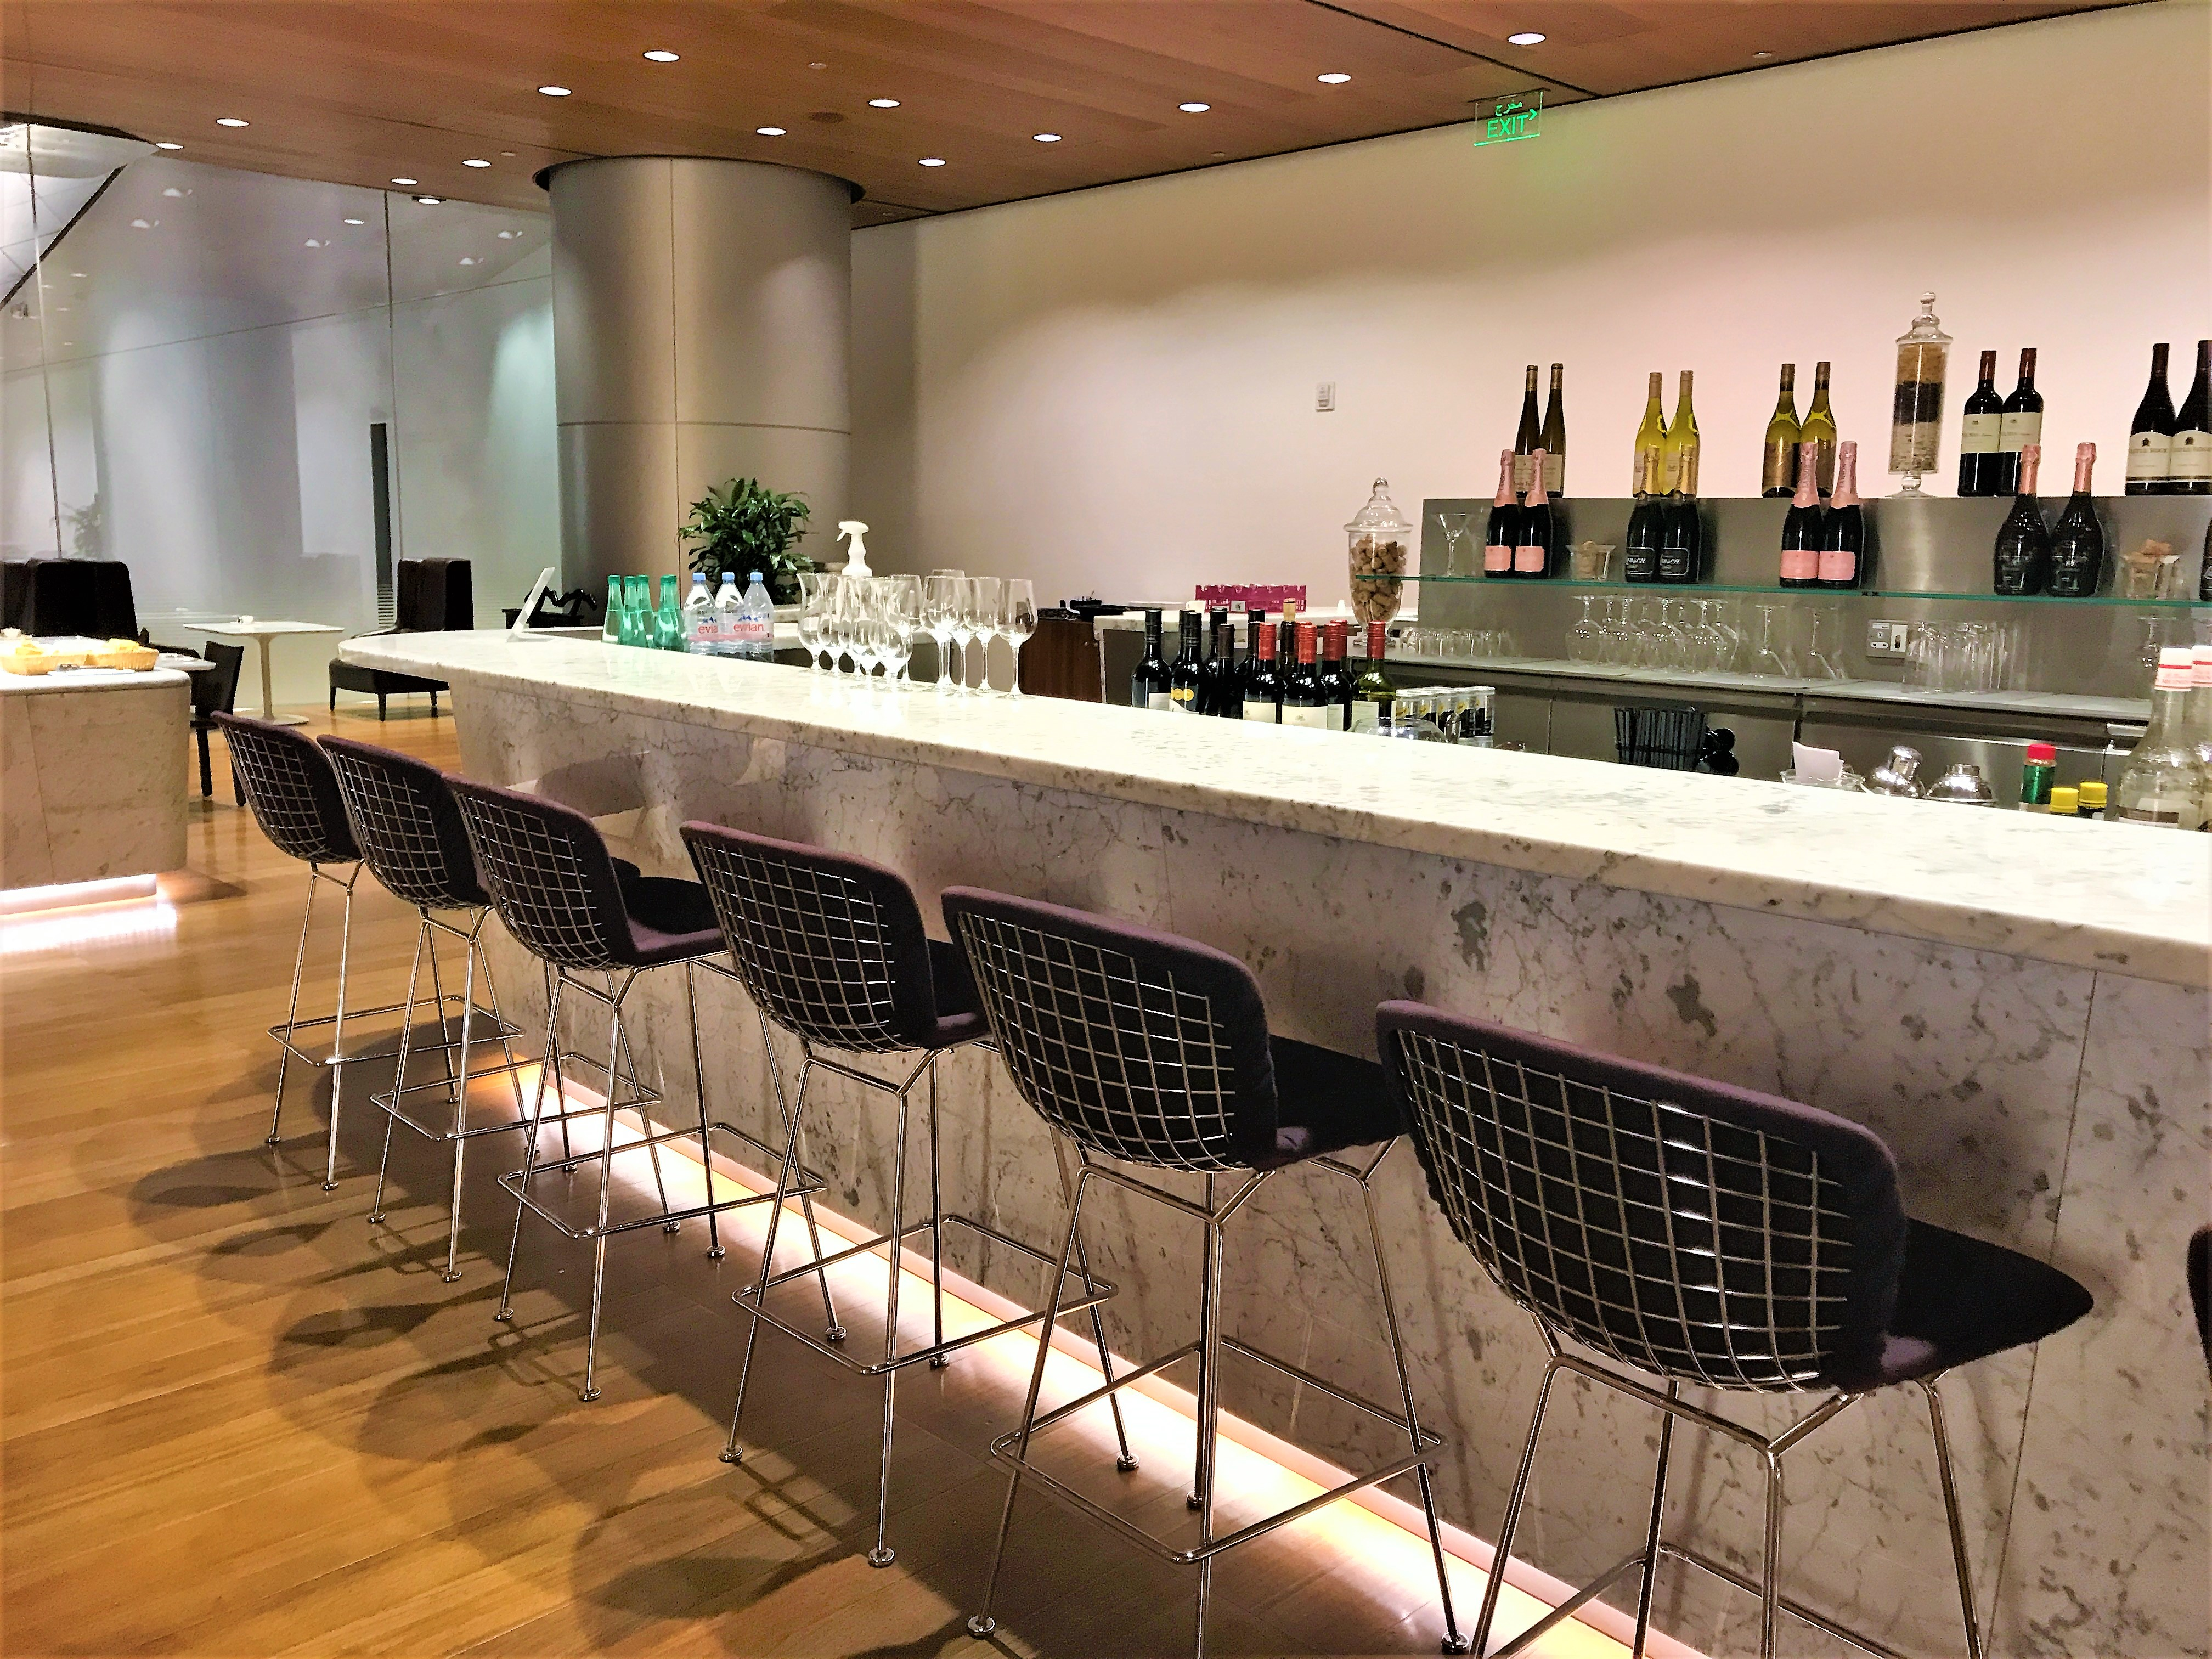 Qatar Airways Business Class Al Mourjan lounge Doha review bar